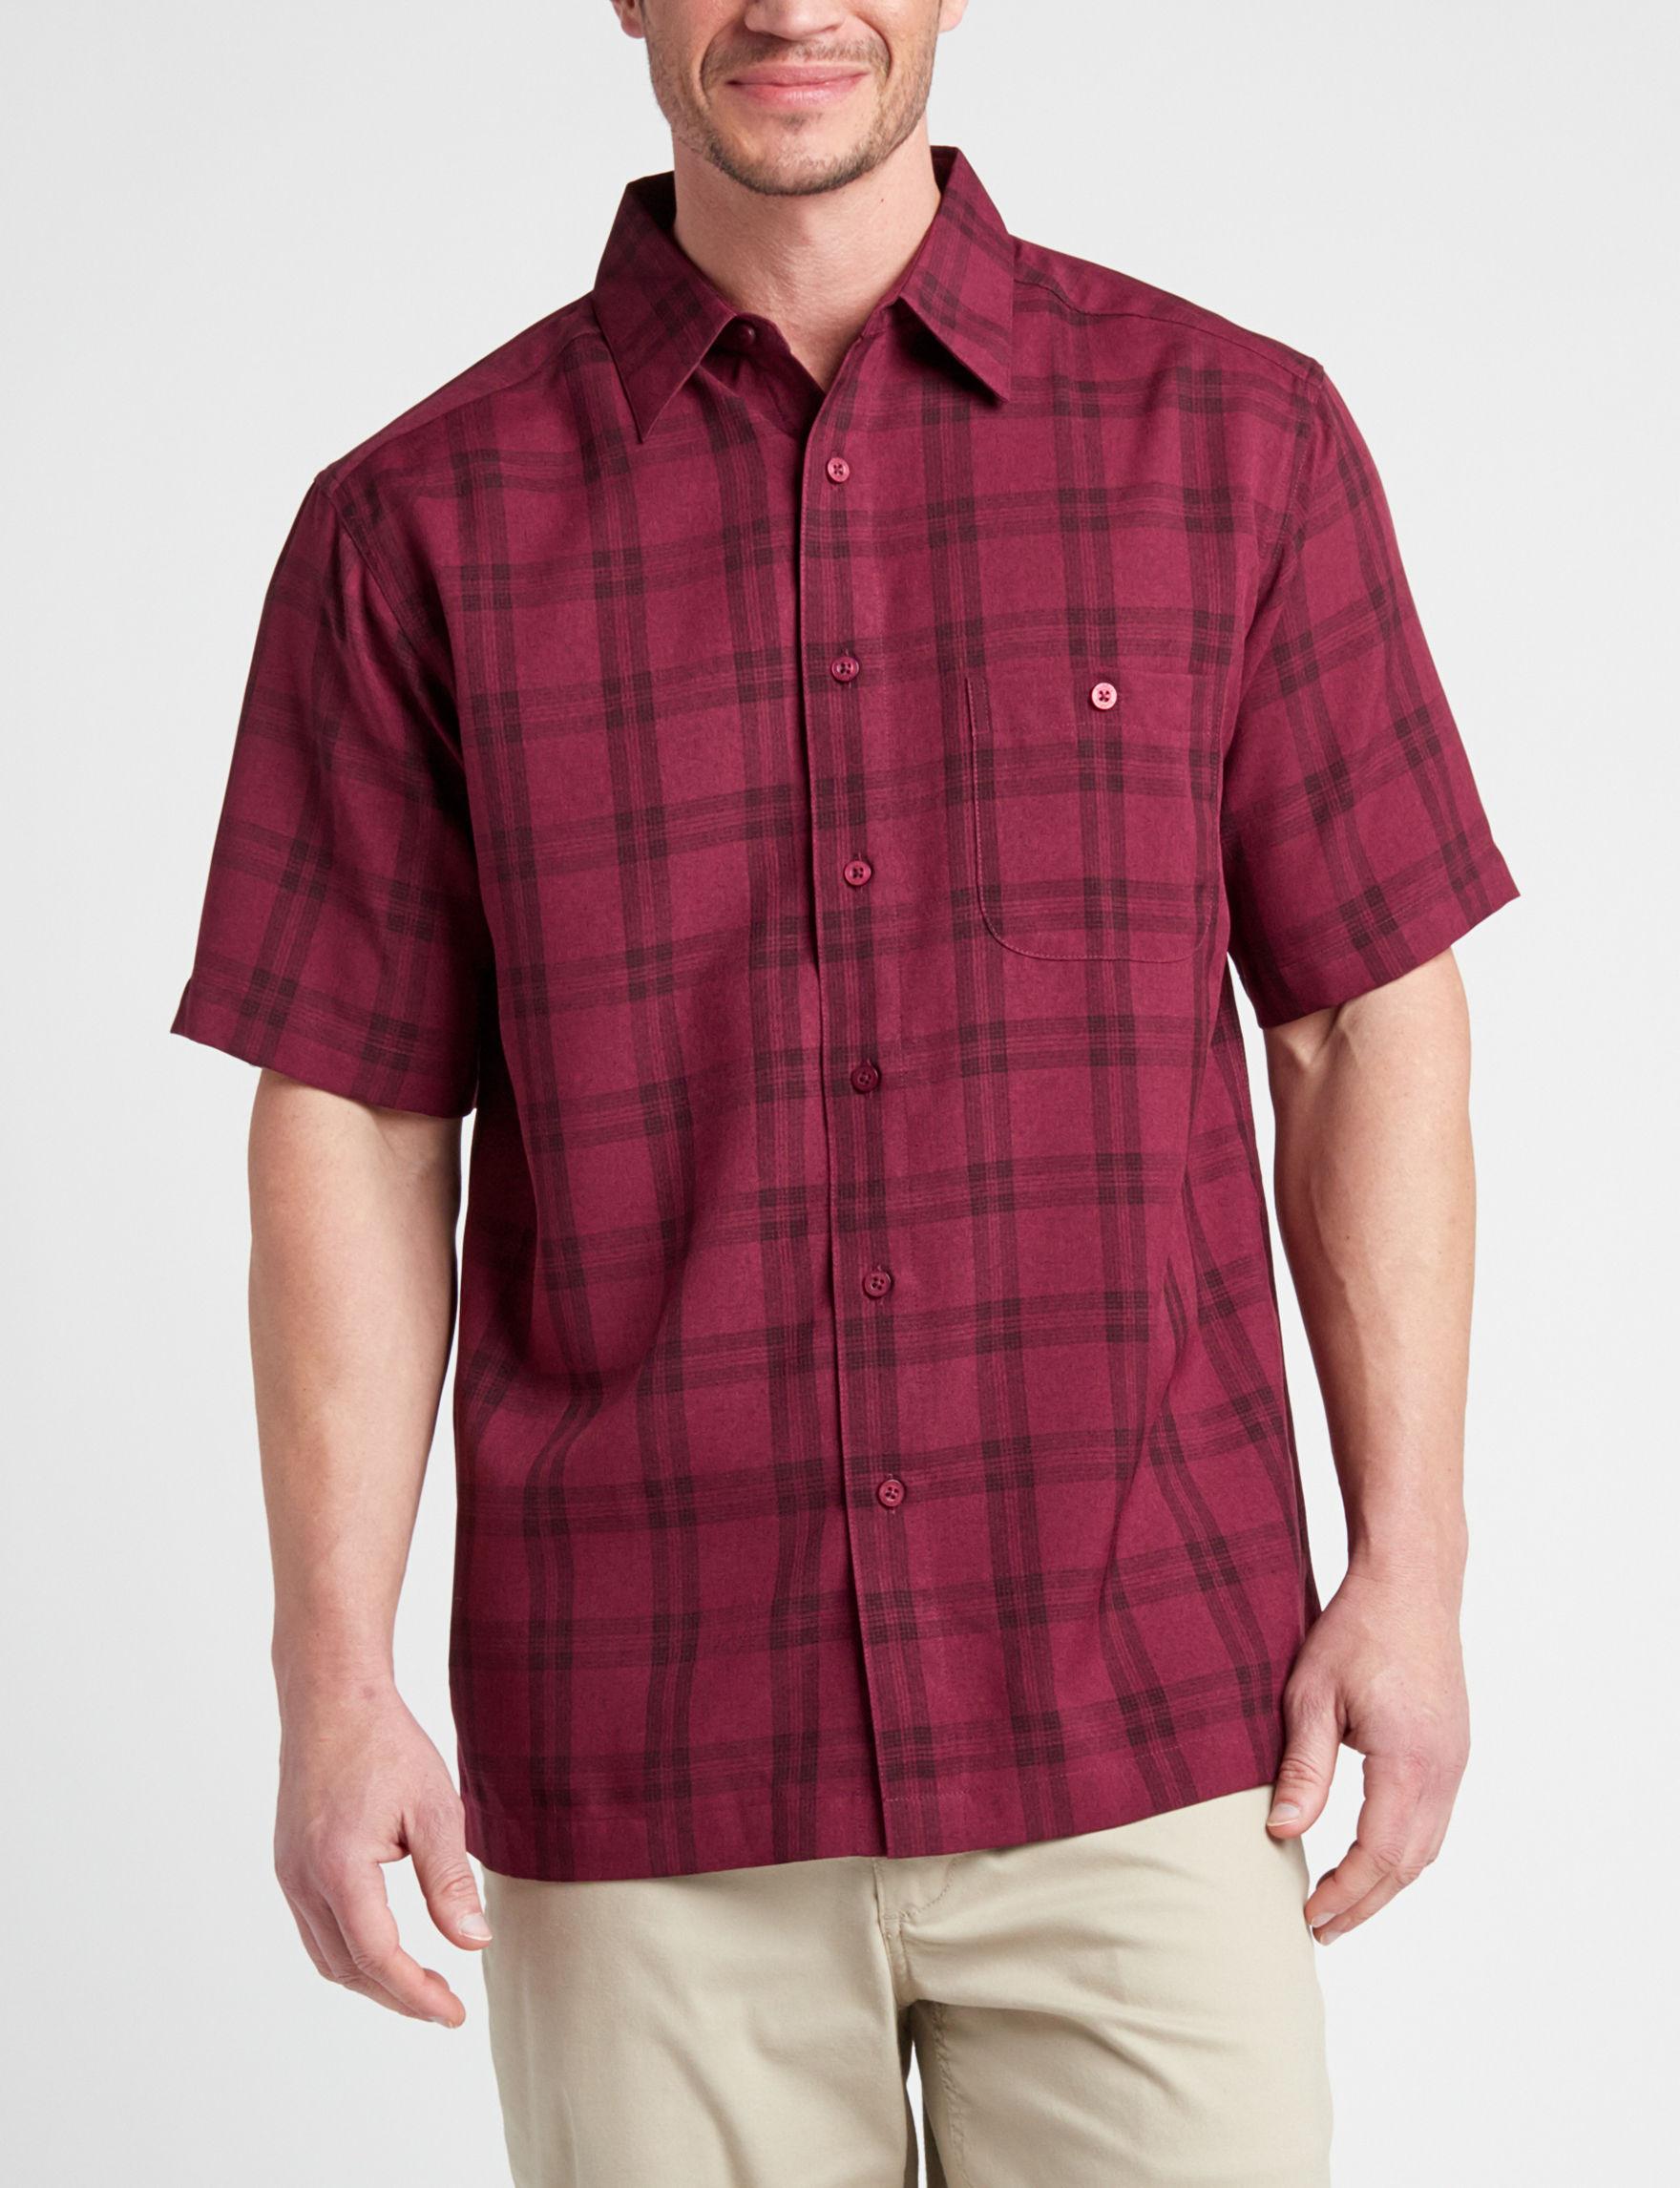 Haggar Burgundy / Black Casual Button Down Shirts